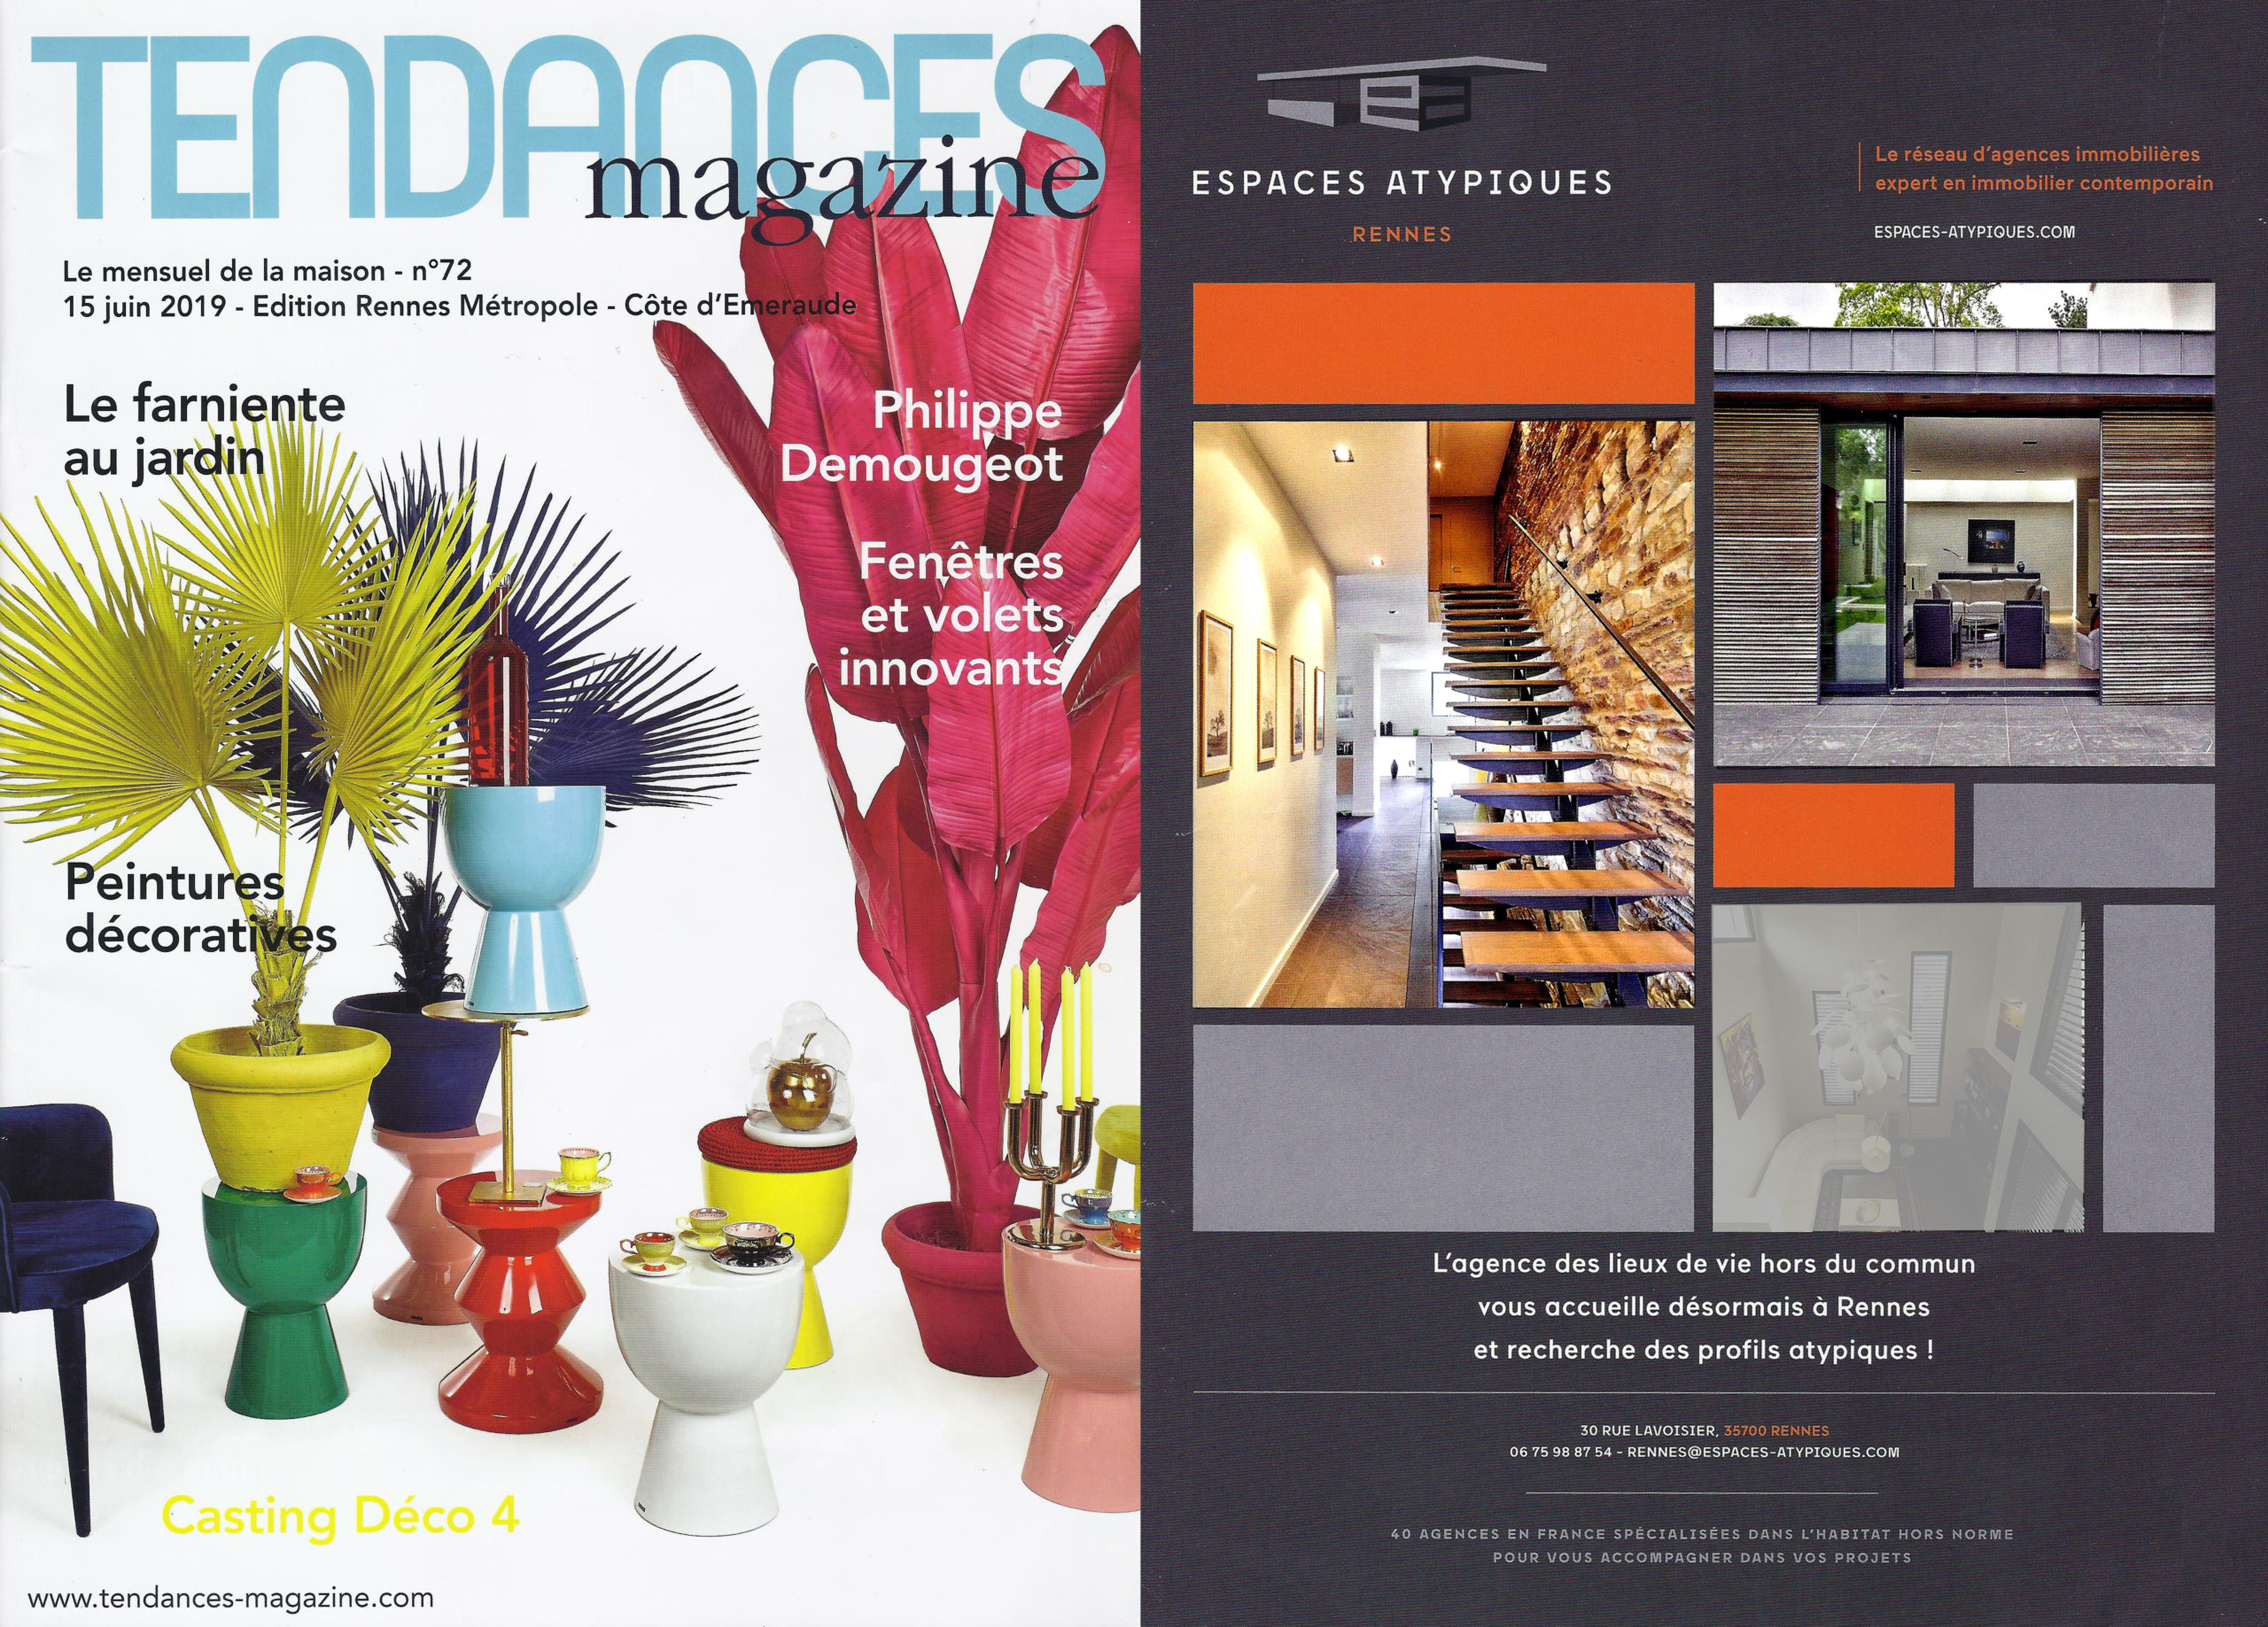 Tendance Magazine - Maison Dulion